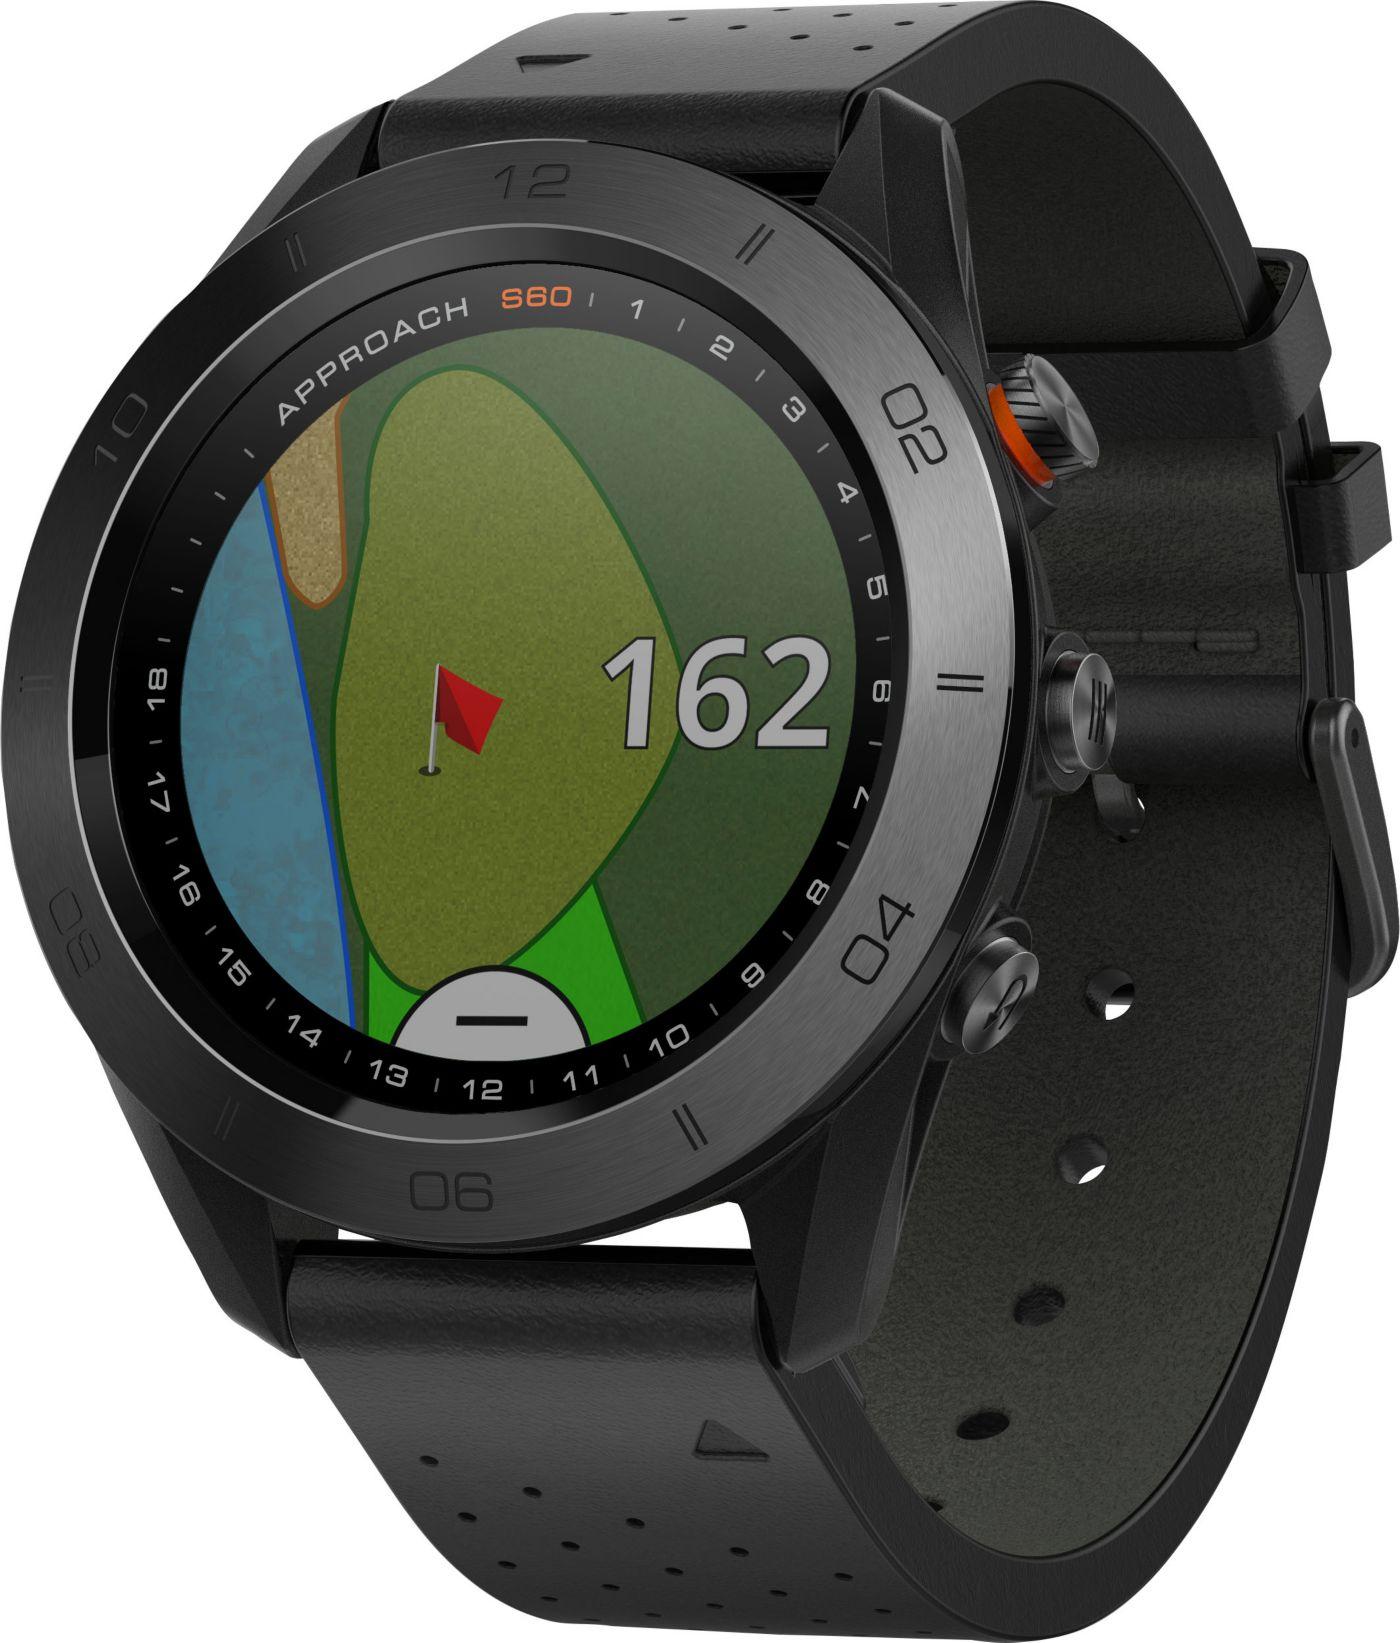 Garmin Approach S60 Premium GPS Watch